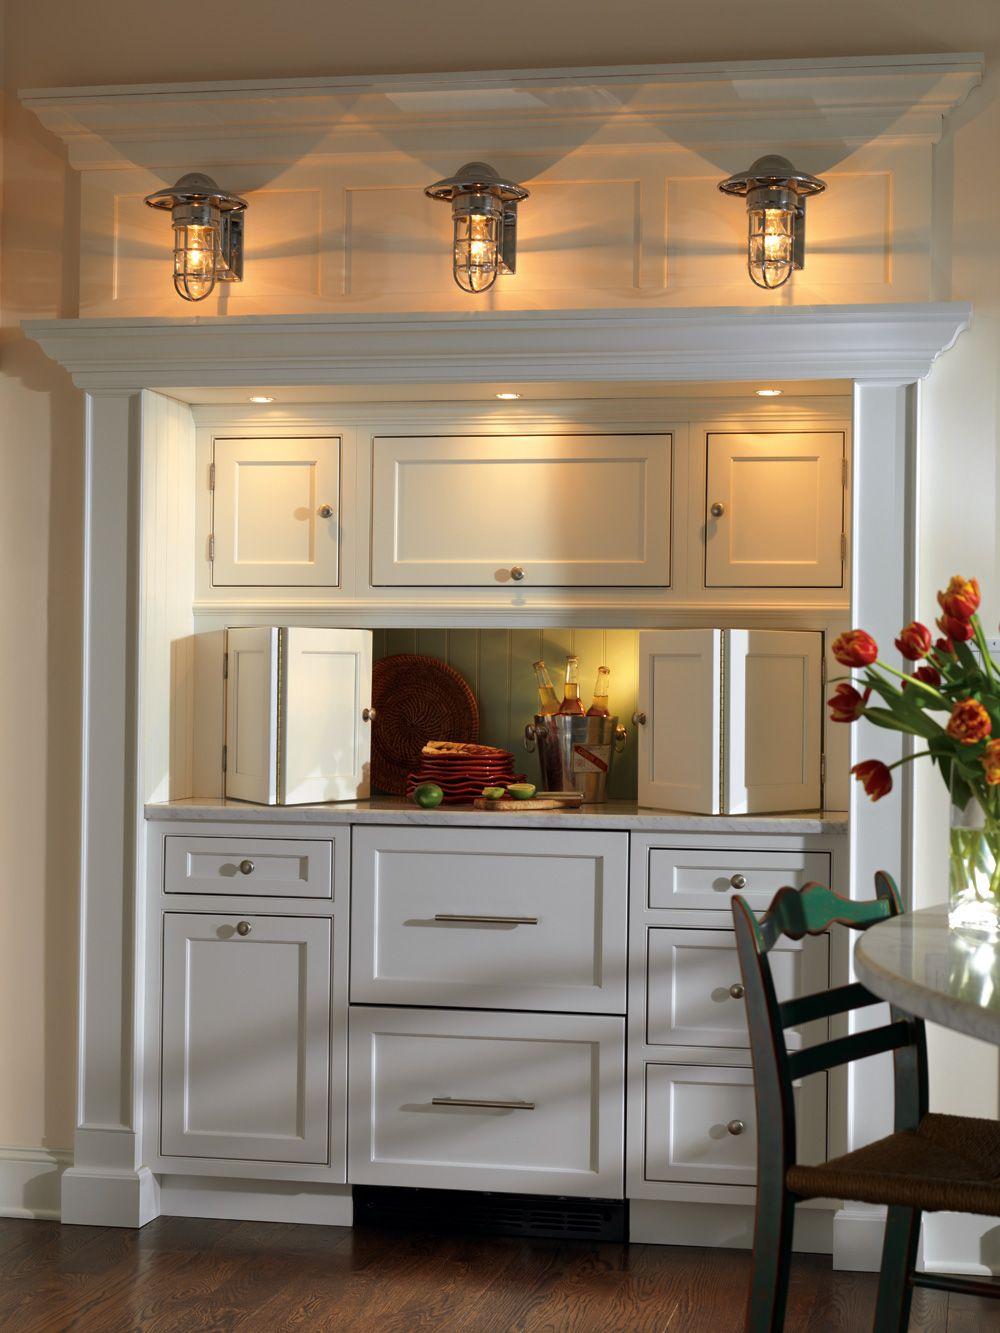 Pass through | Cottage style kitchen, Cottage kitchen ...